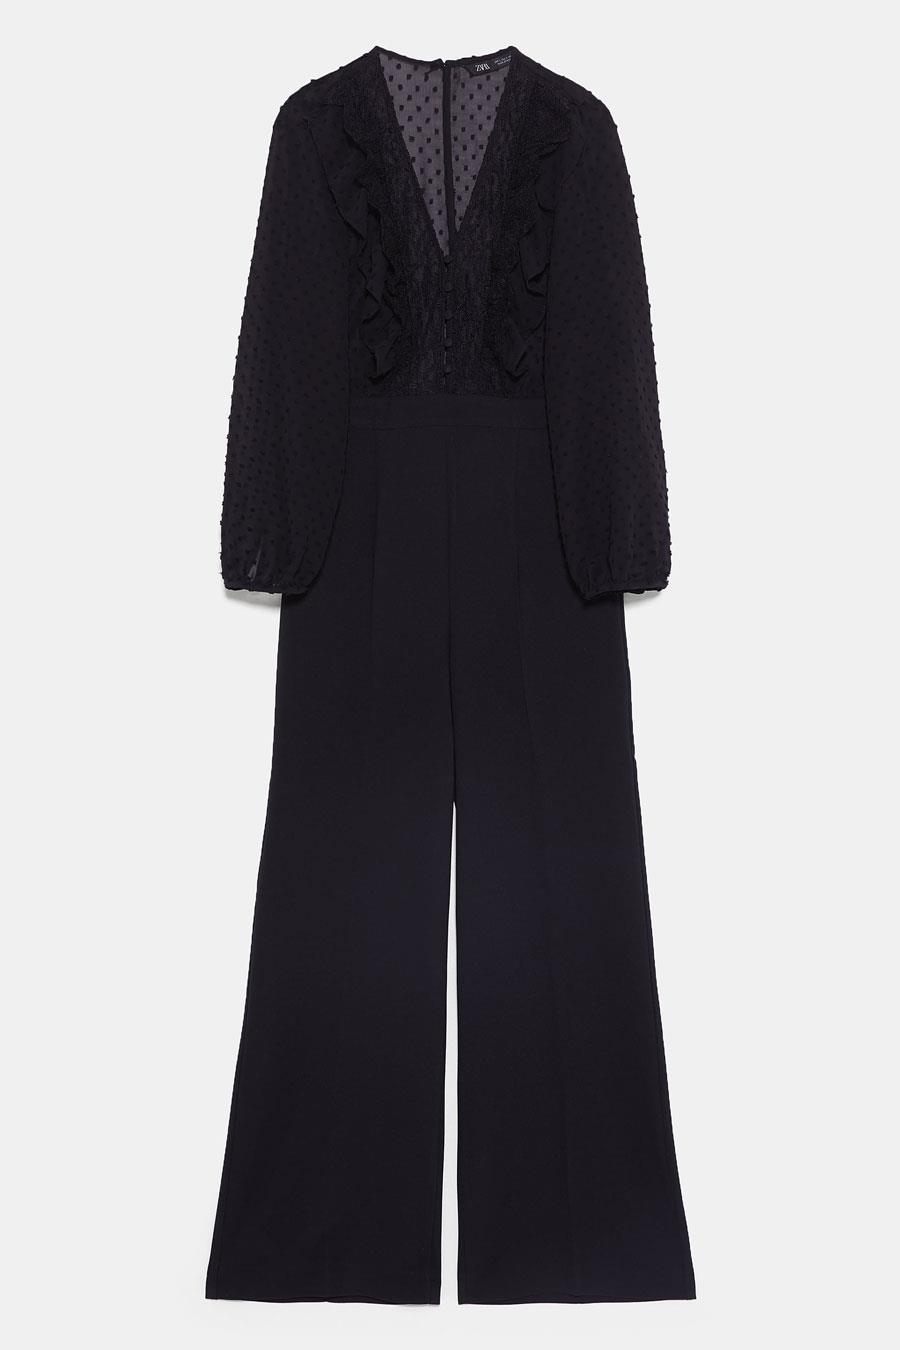 Vestido negro fluido zara